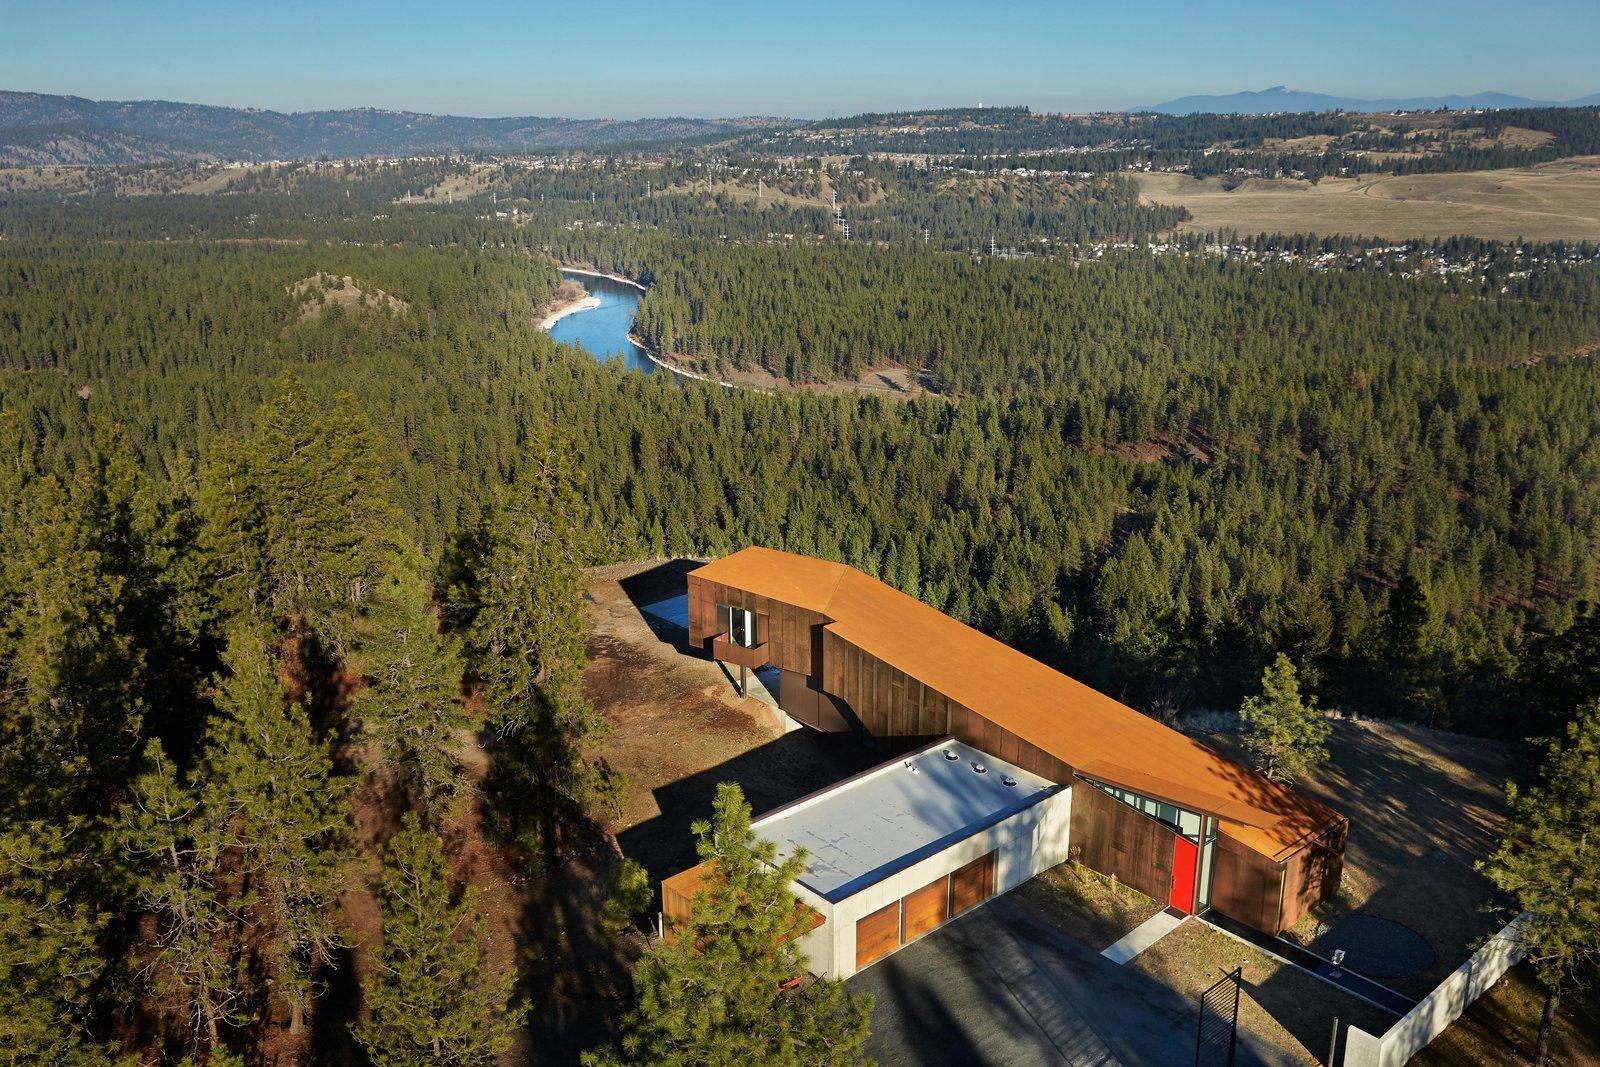 Exterior, House Building Type, and Metal Siding Material Rimrock | Olson Kundig  Rimrock by Olson Kundig